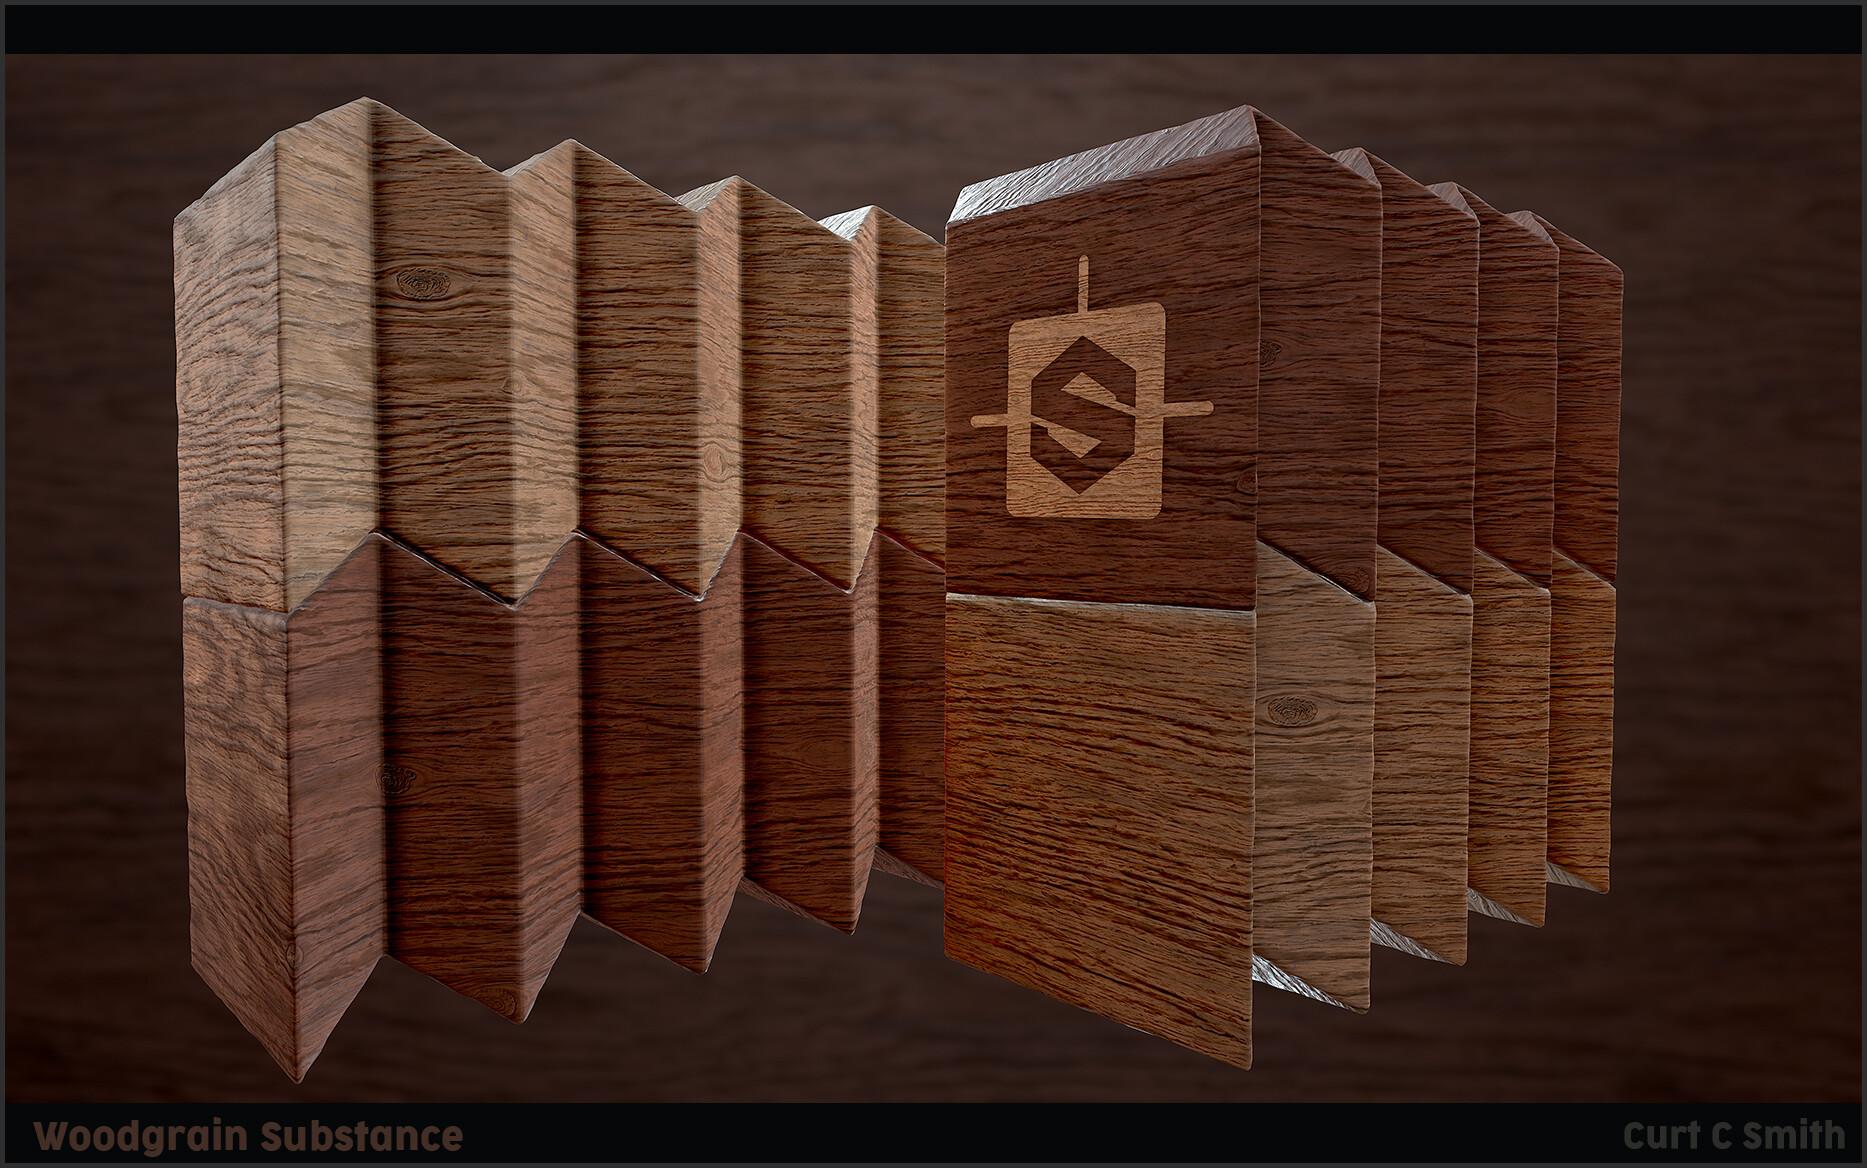 ArtStation - Wood Grain Substance, Curt C  Smith